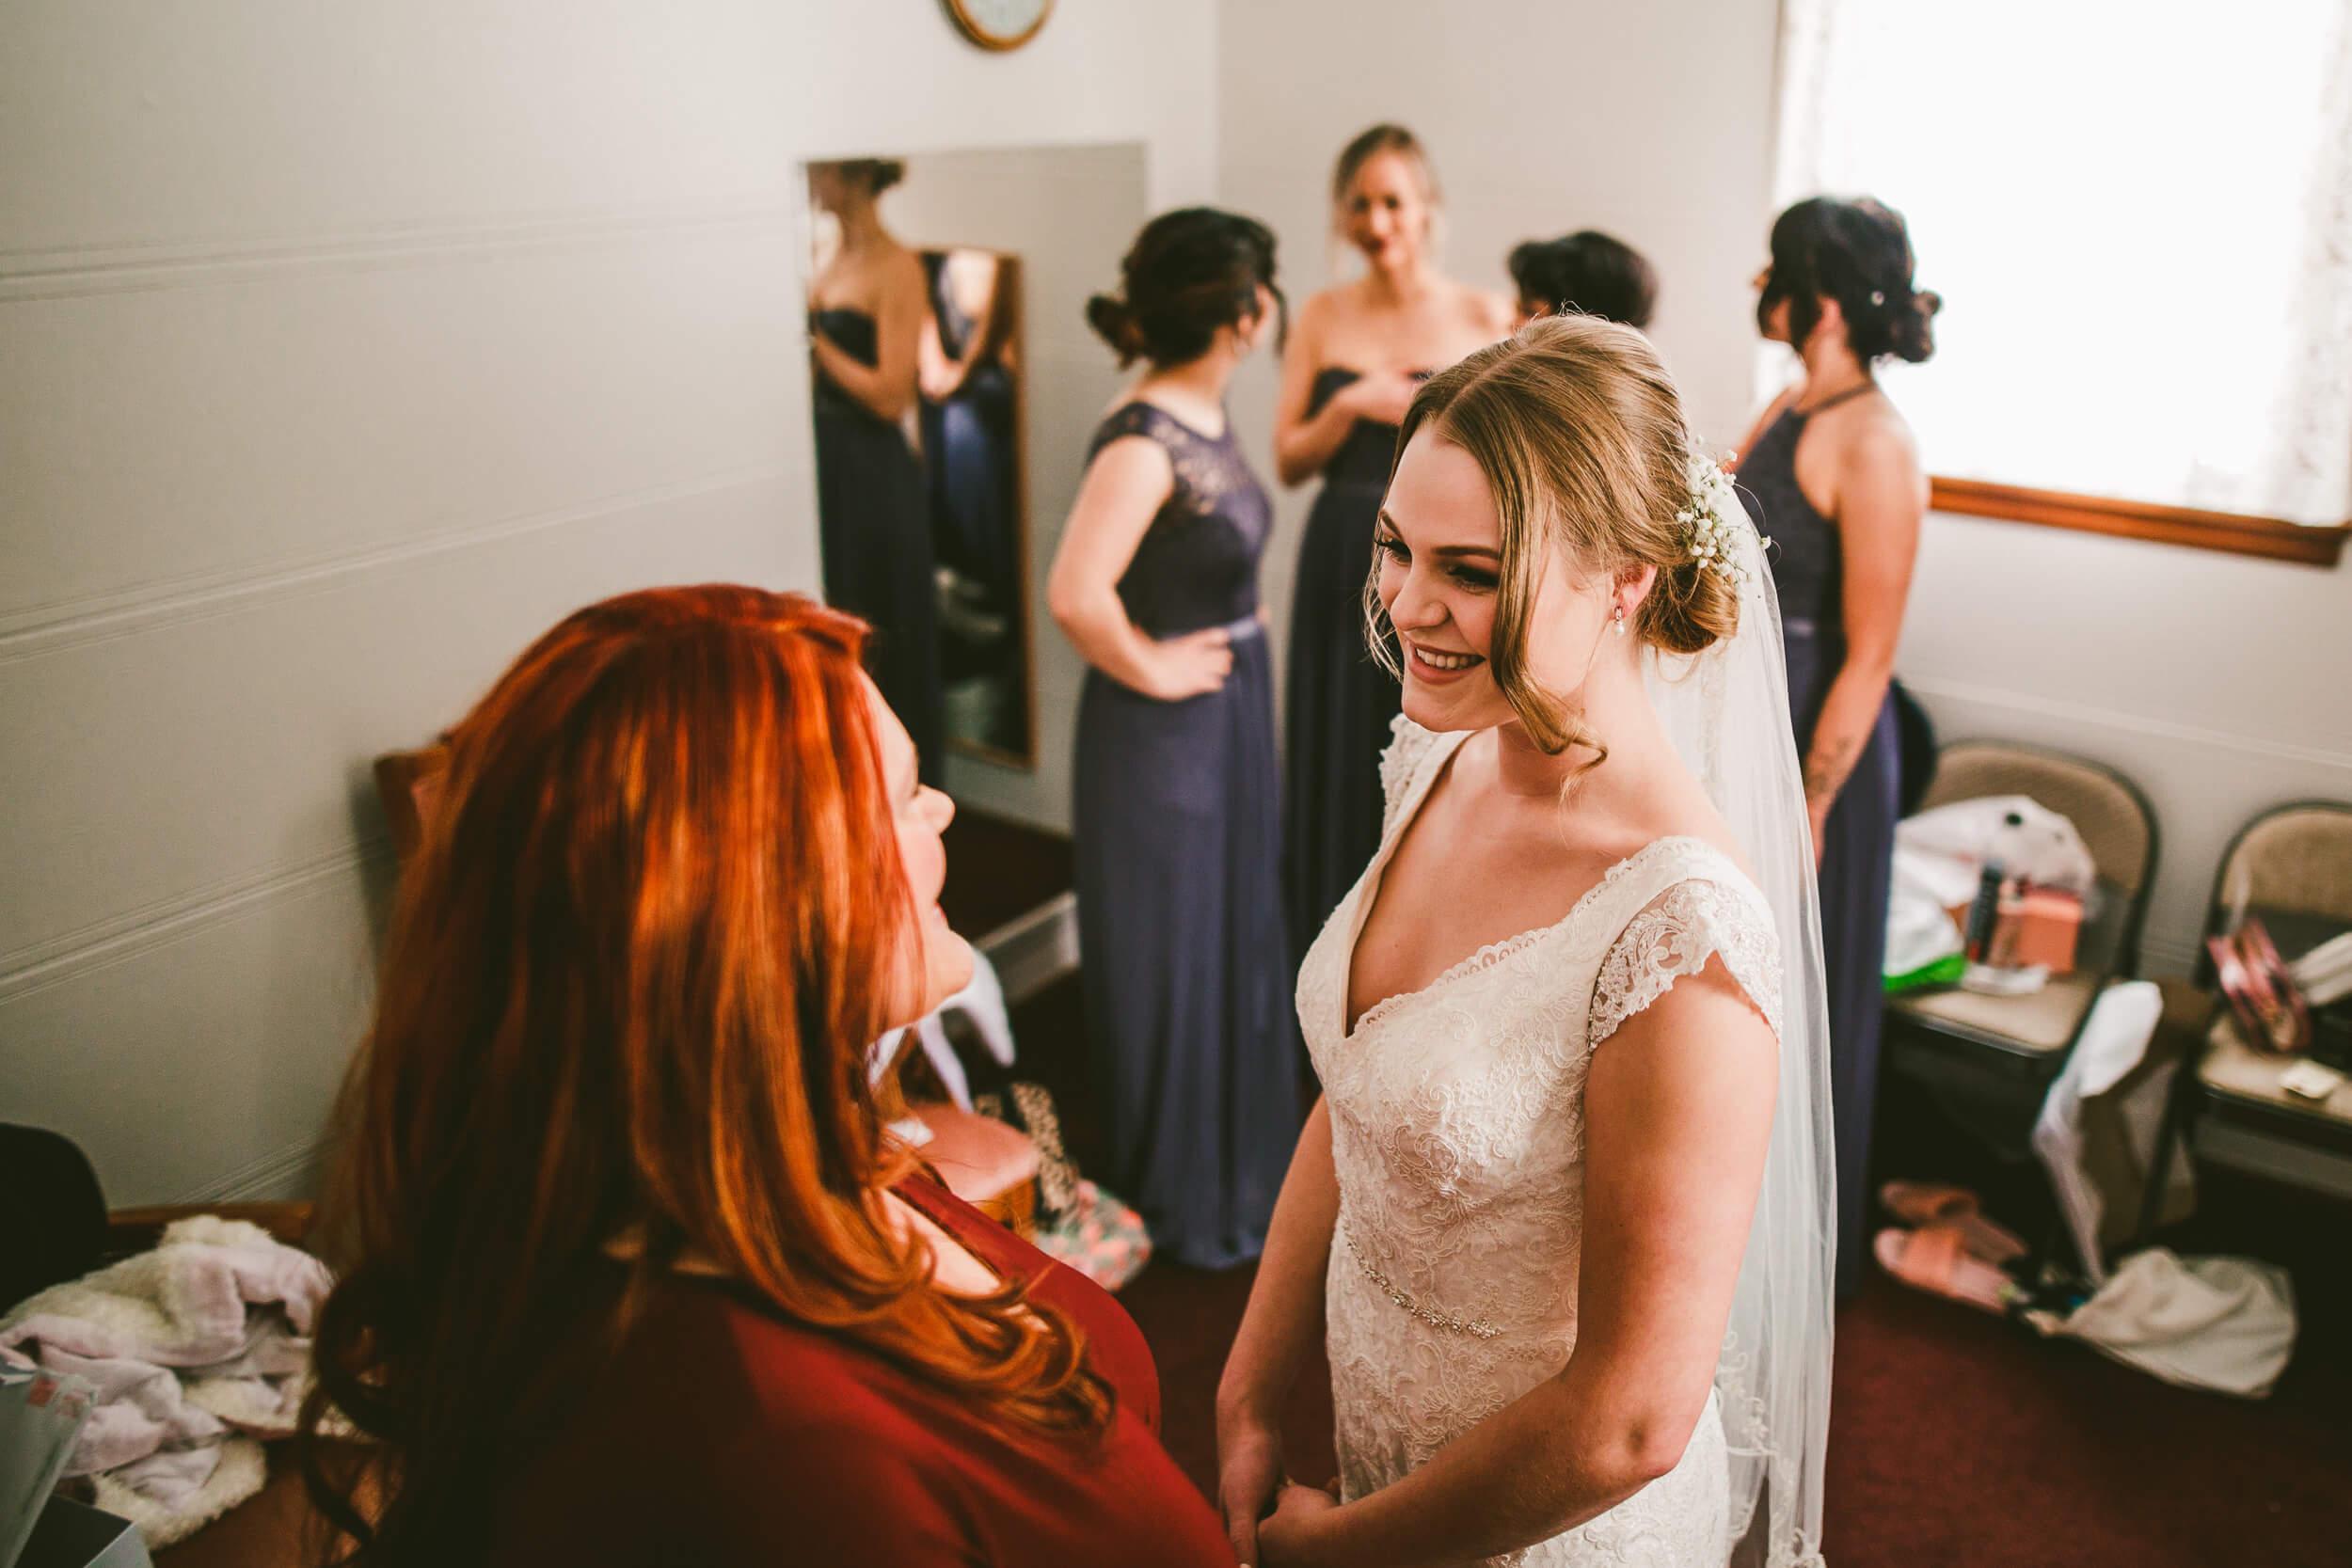 mukogawa winter wedding in spokane (49).jpg